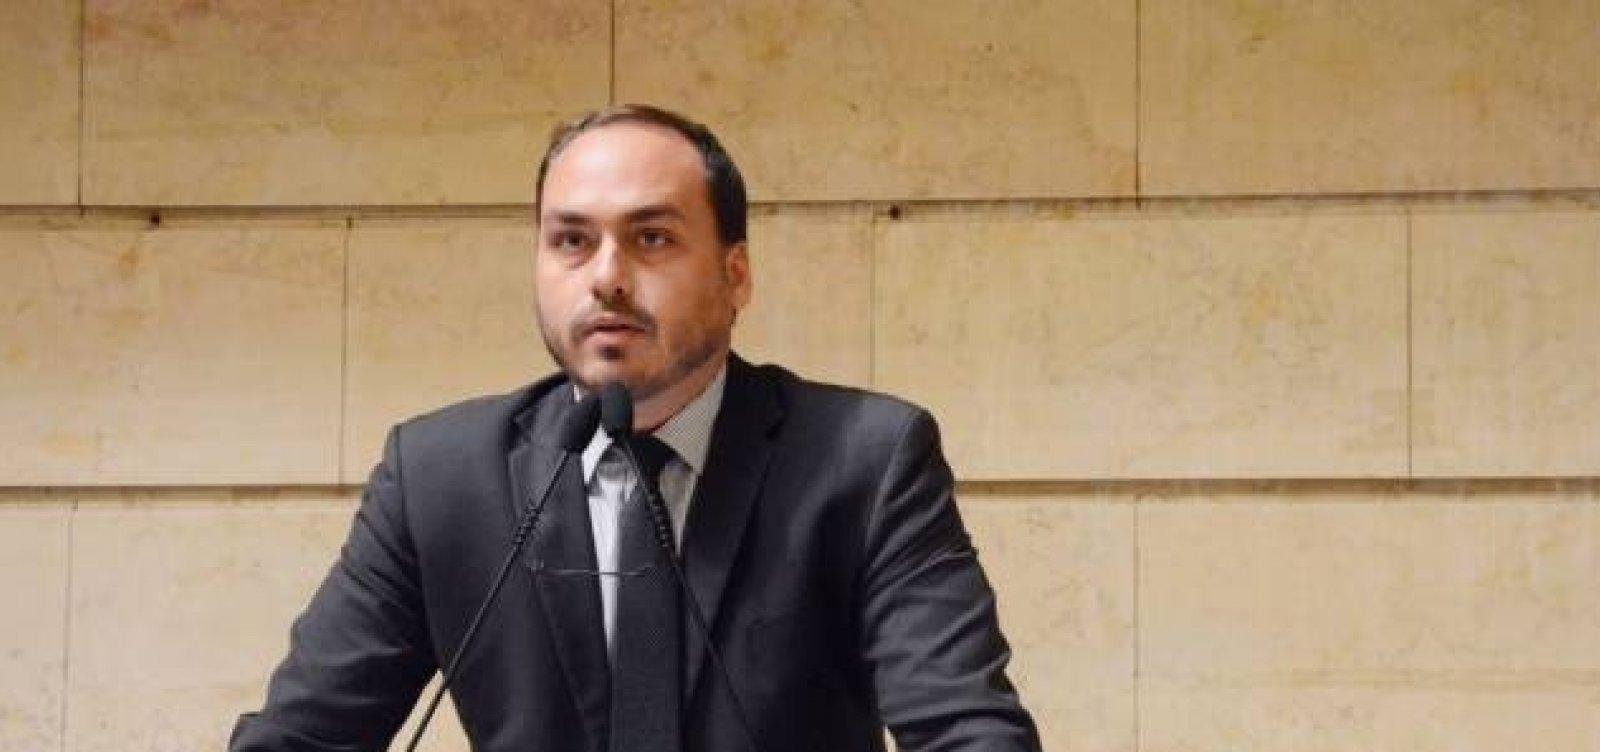 [MP-RJ investiga Carlos Bolsonaro por uso de funcionários fantasmas]